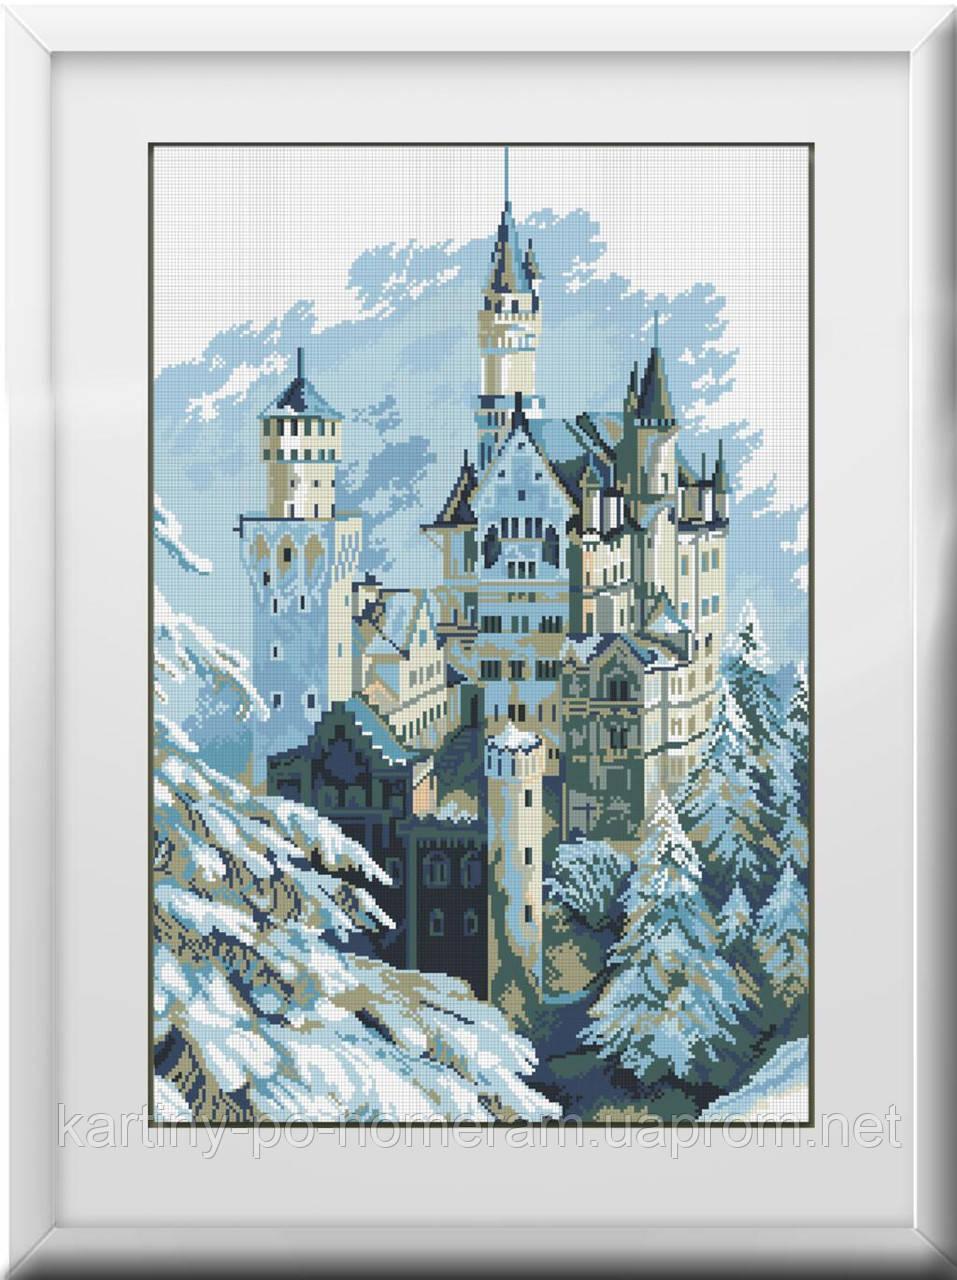 Вышивка камнями Dream Art Зимний замок (полная зашивка, квадратные камни) (DA-30129) 49 х 72 см